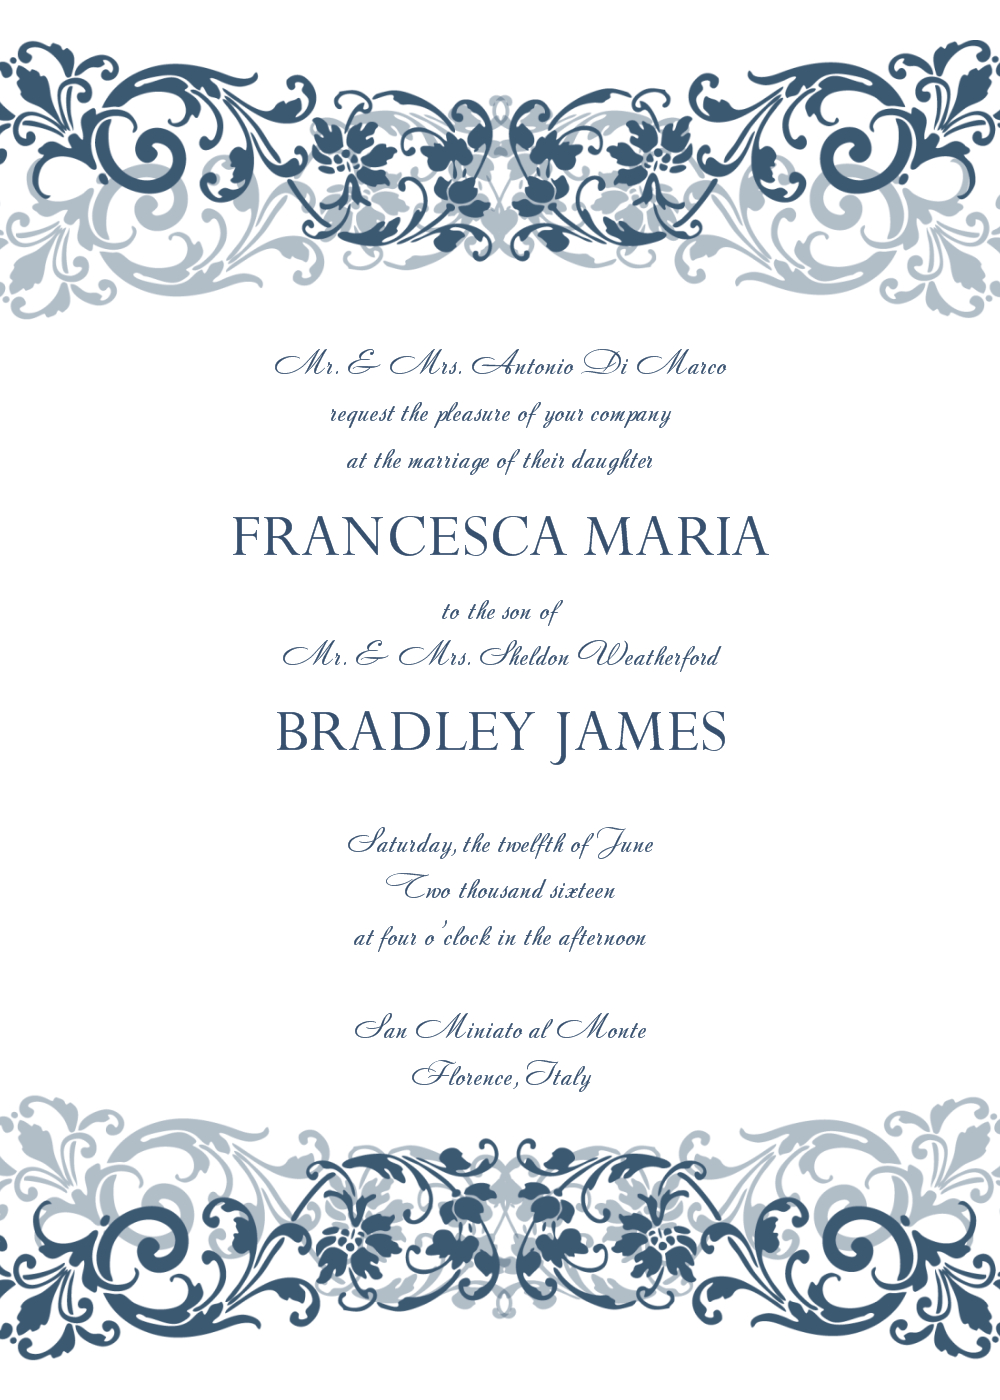 Wedding Invitation Templates | Invitation | Pinterest | Free Wedding - Free Printable Wedding Scrolls